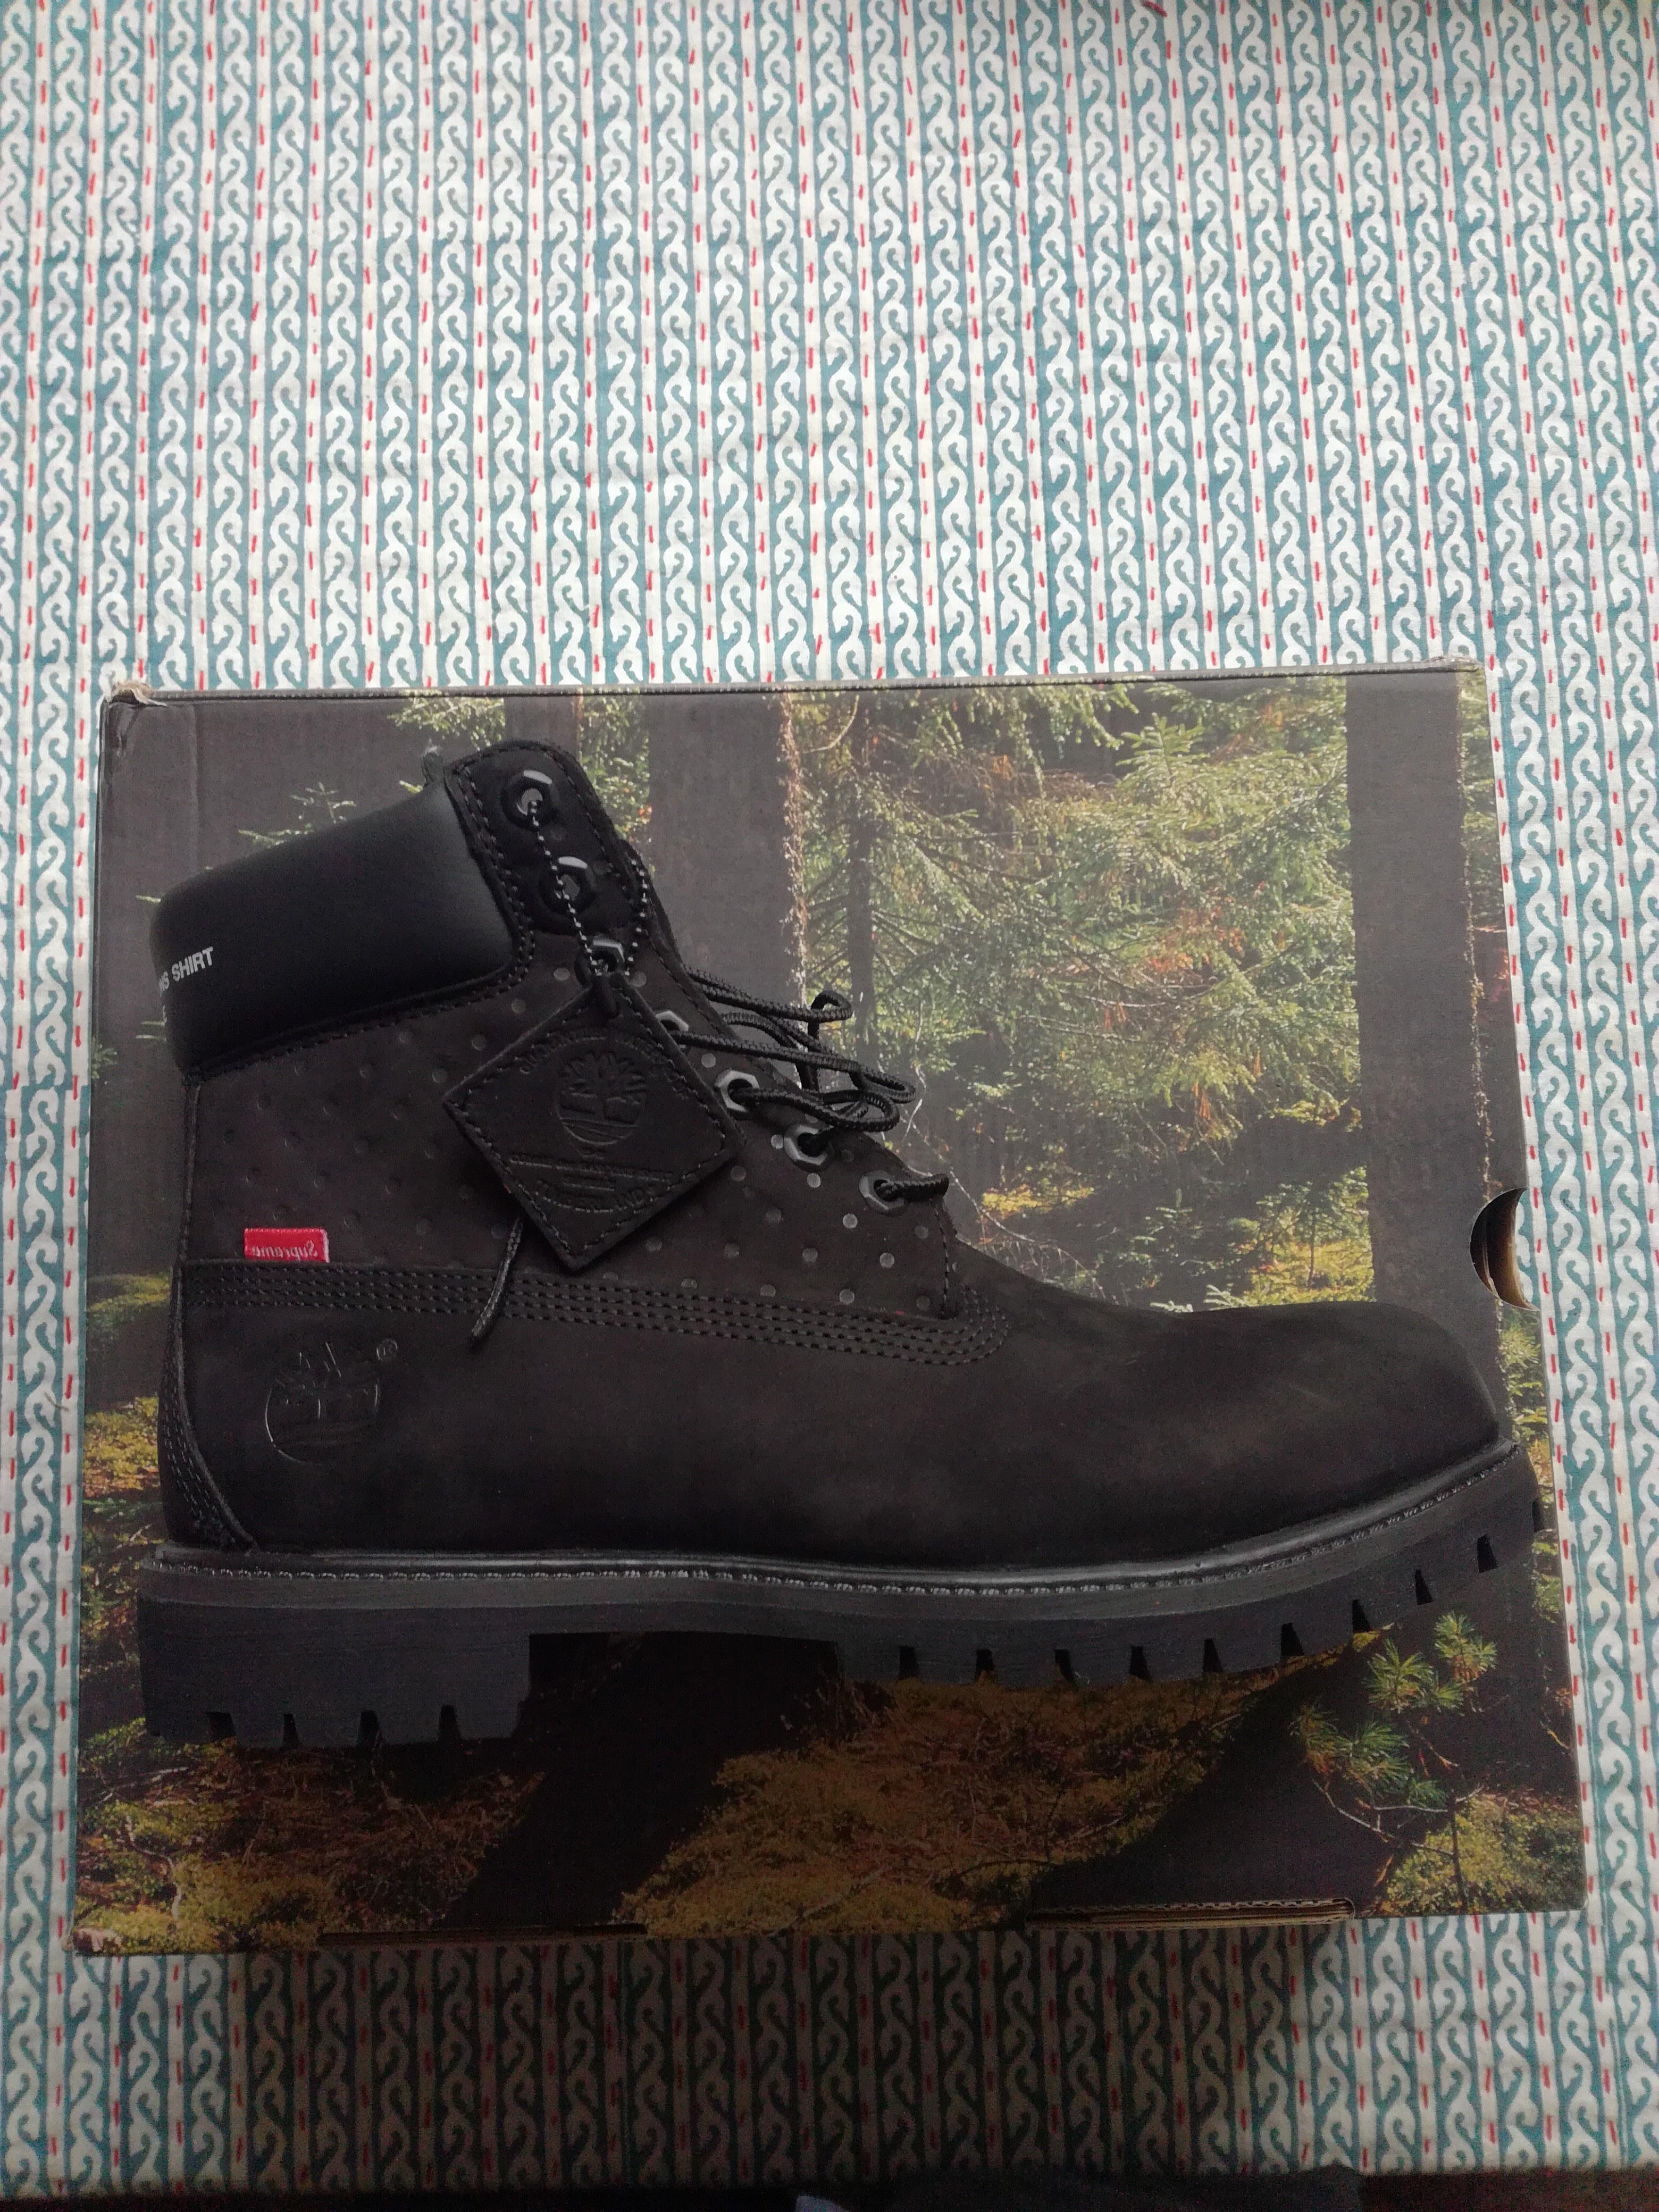 Comme des Garçons SHIRT®Supreme. Timberland® 6 Inch Premium Waterproof Boot